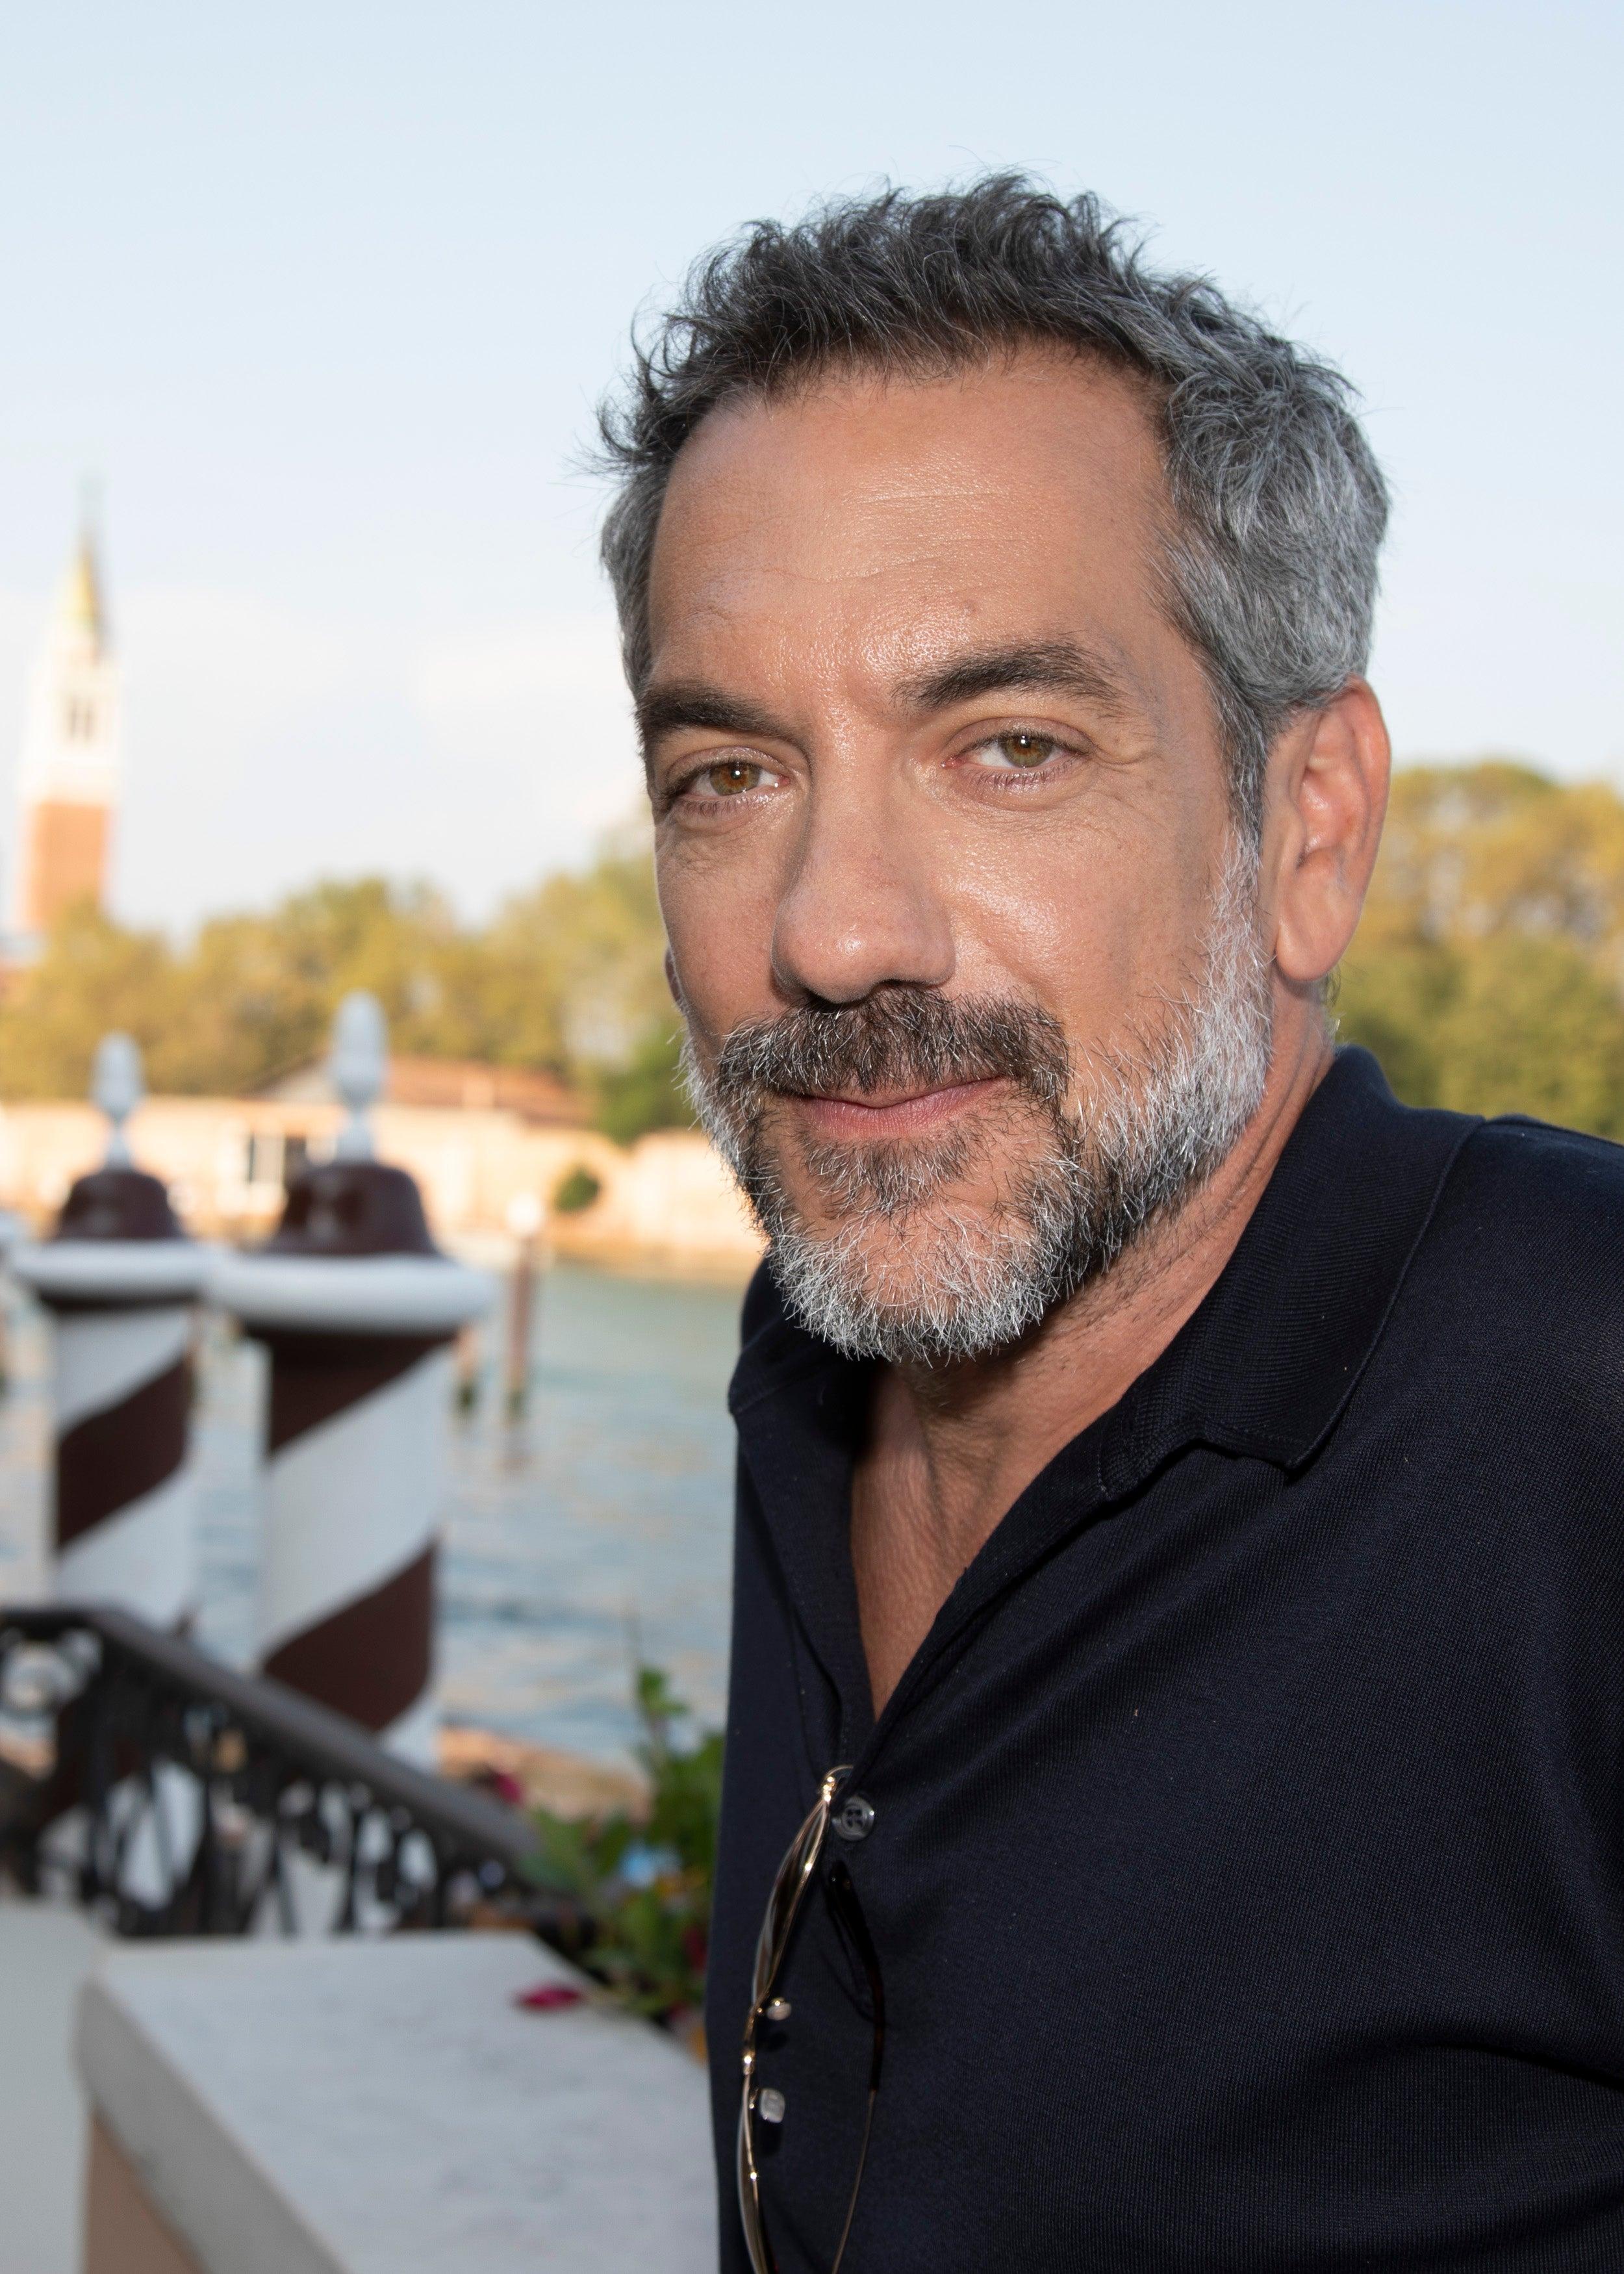 Director Todd Phillips